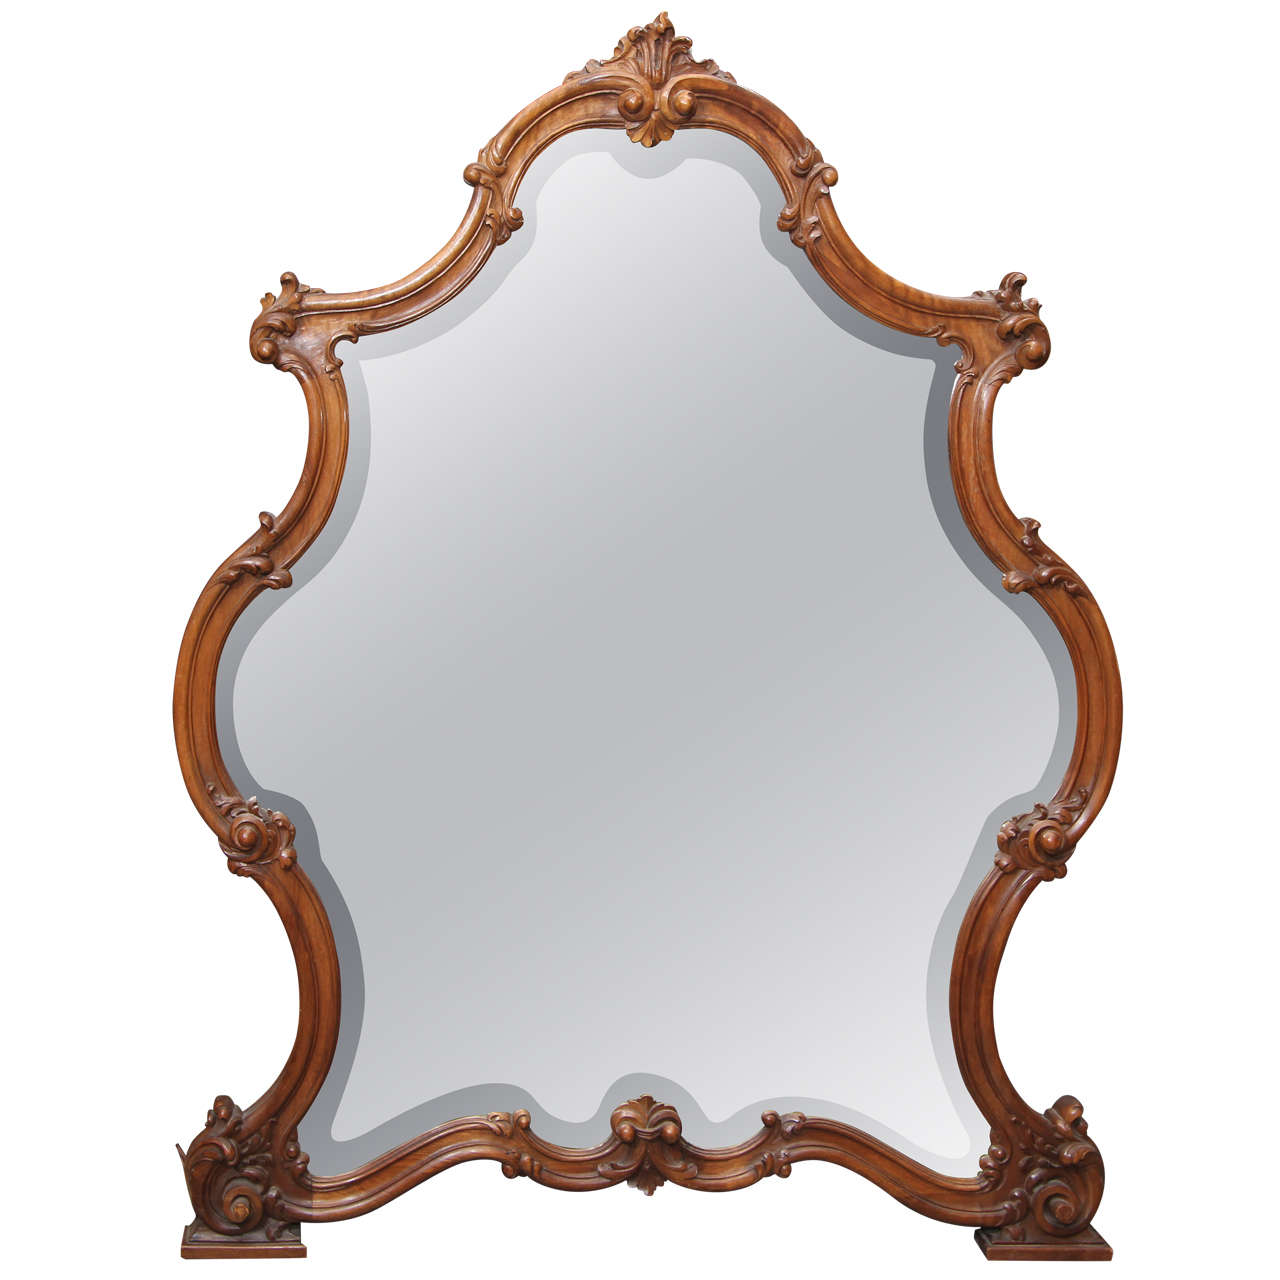 mirror  Discount School Supply